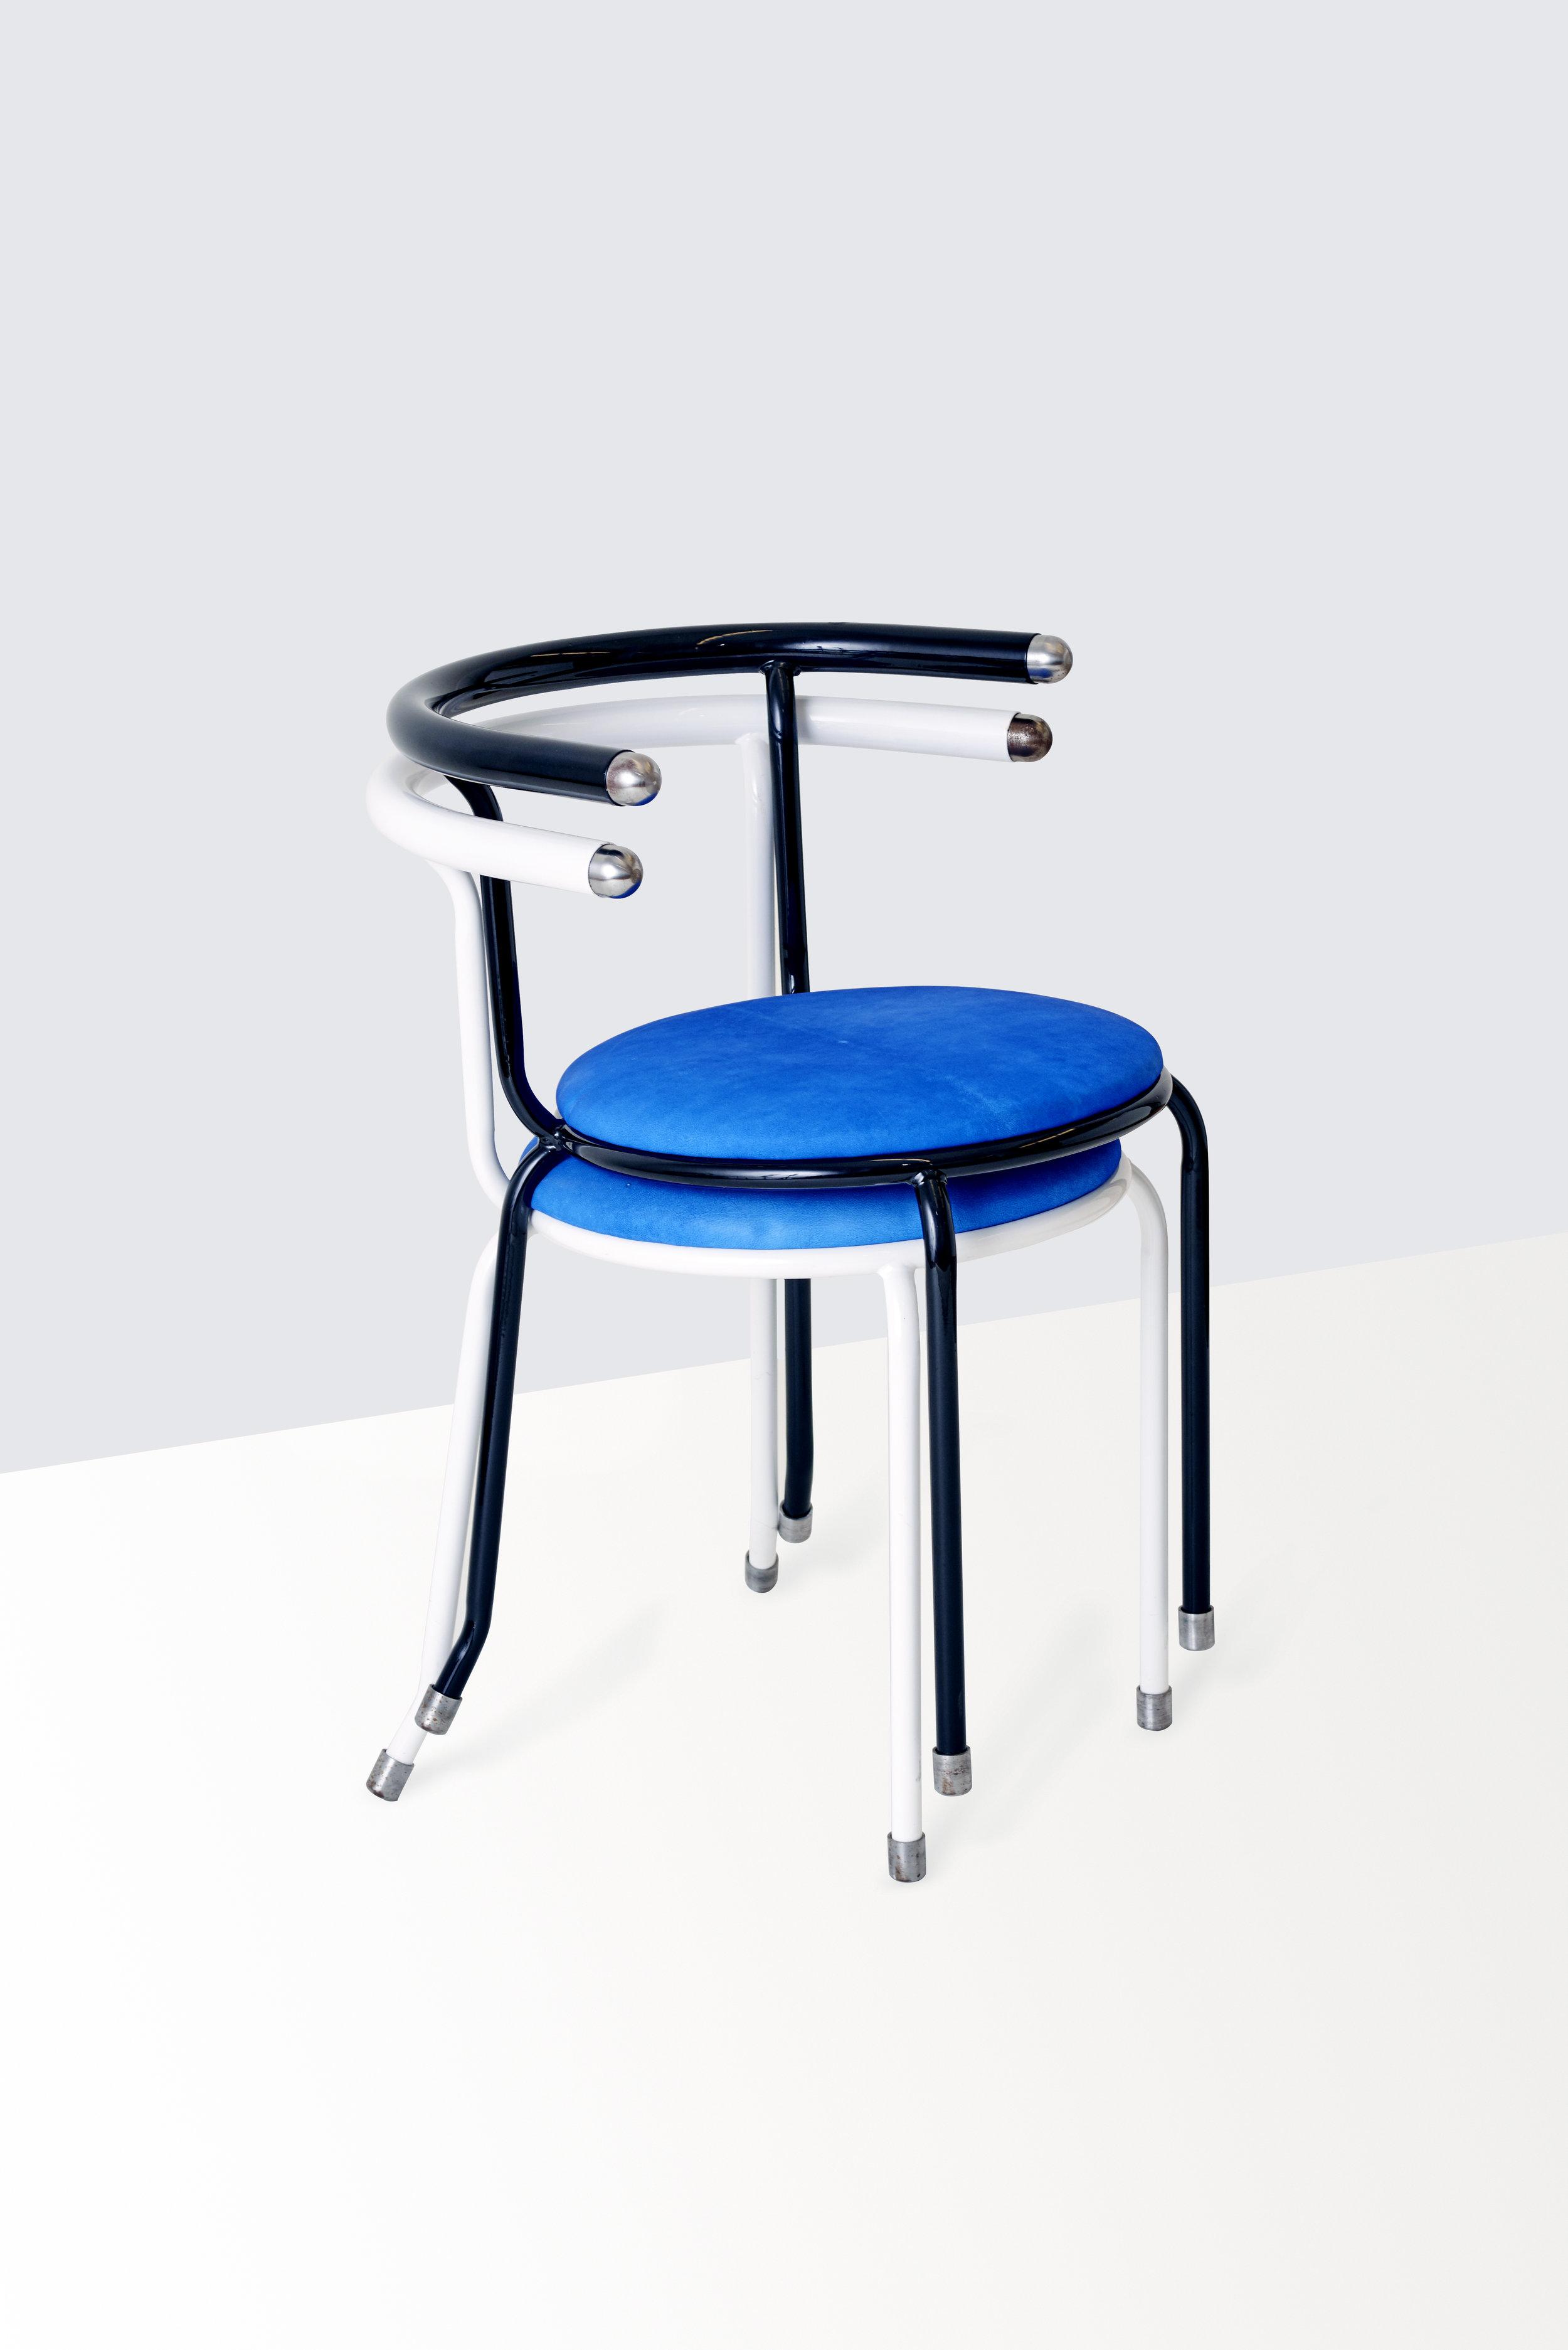 "Dozie Kanu. ""Chair [i]"" (2016). POWDER COATED TUBULAR STEEL, WOOD, POLYURETHANE FOAM, NUBUCK LEATHER. 20 x 20 x 28 inches. Courtesy the artist. Photo: Kyle Rudd."